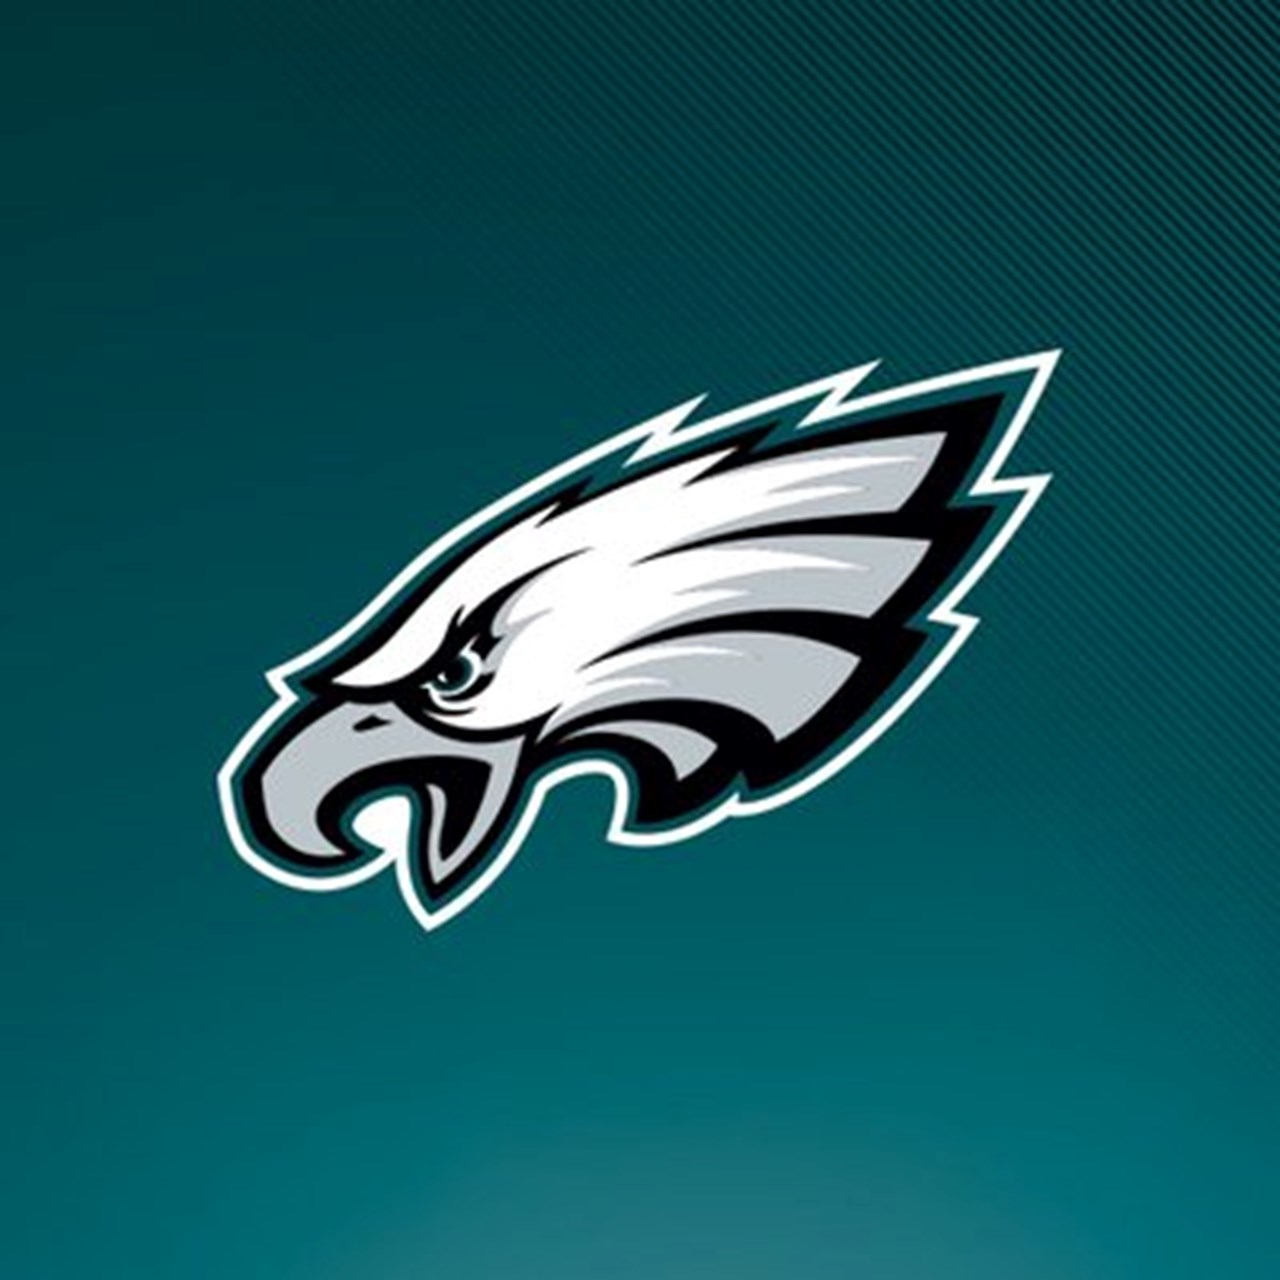 Saints' Rankins, Eagles' Cox, Brooks injured during Sunday's game